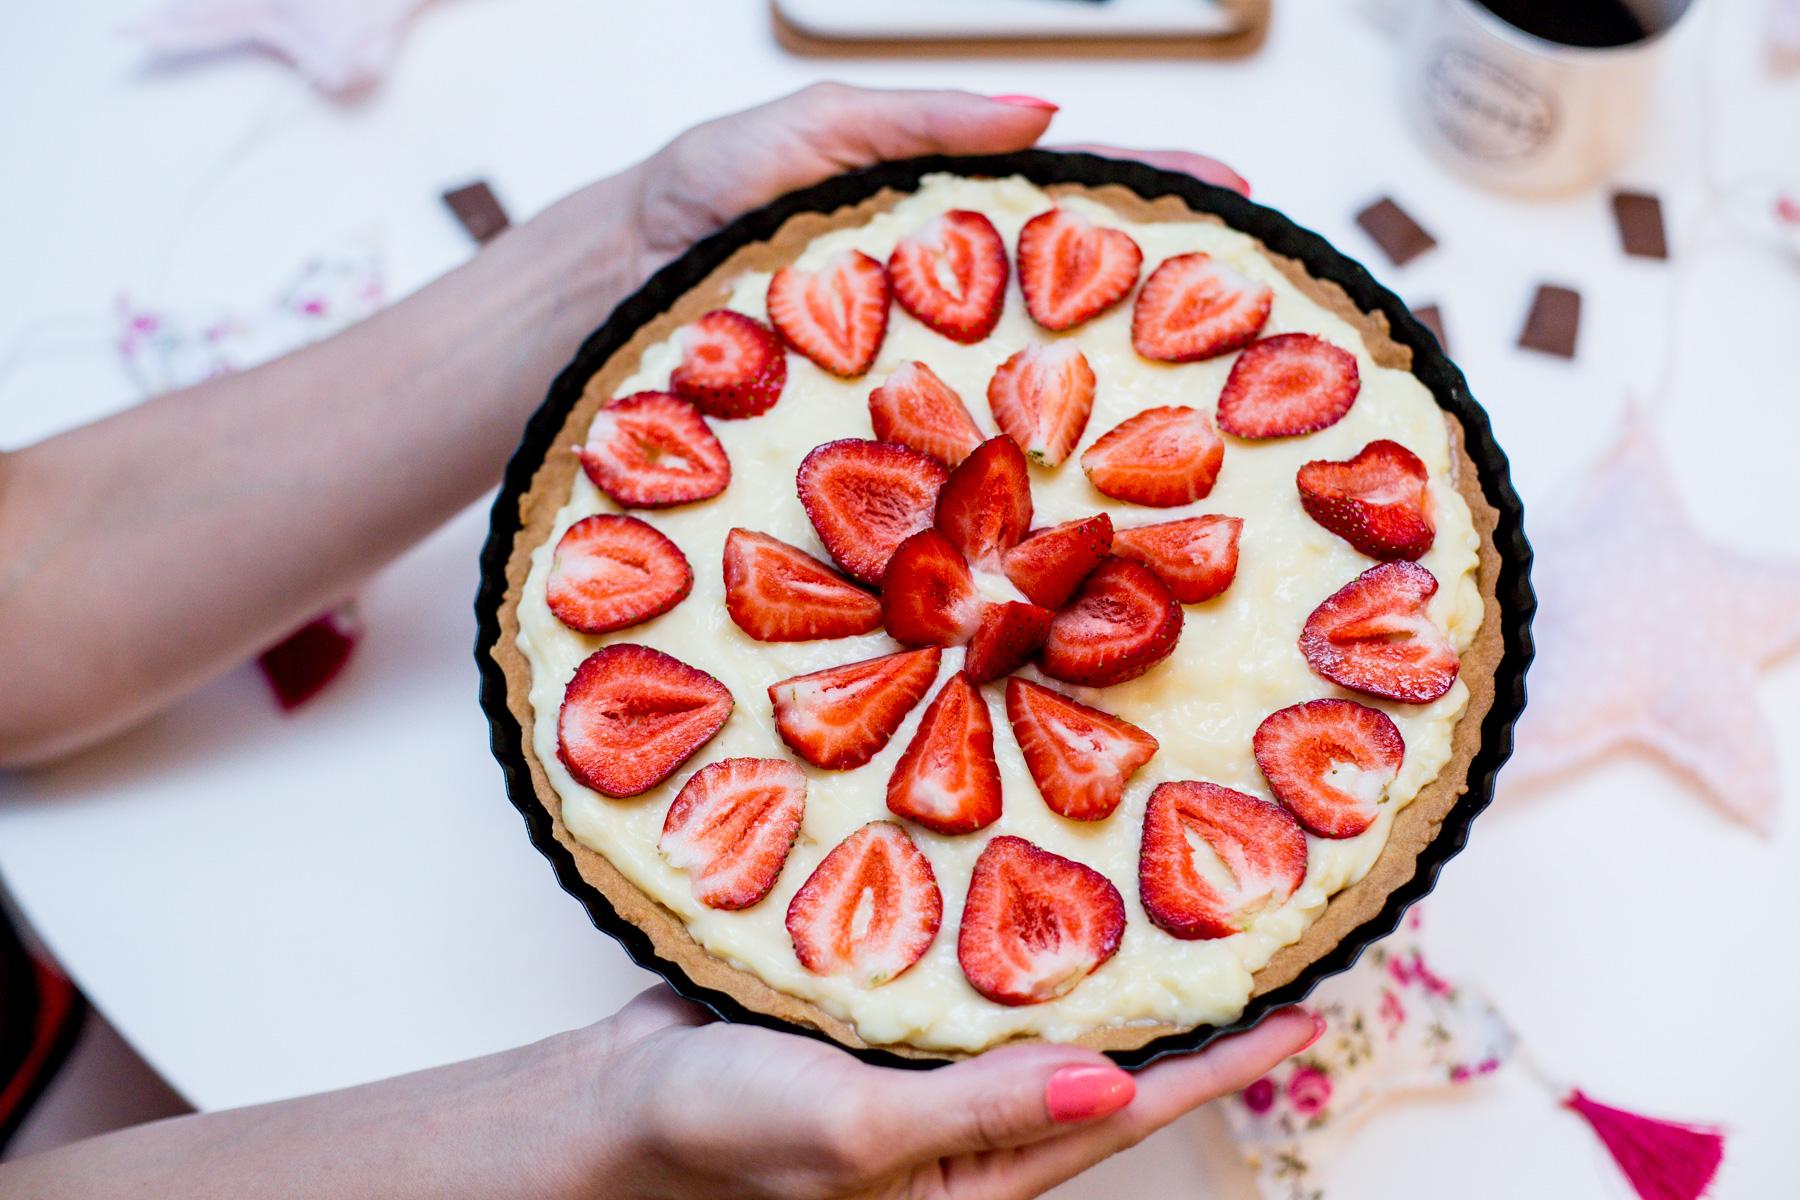 tarta z truskawkami, ciasto z truskawkami, ciasto, truskawki, ciasto na weekend, ciasto na imprezę, ciasto na lato, wiosenna tarta, ciasto z karpatką,